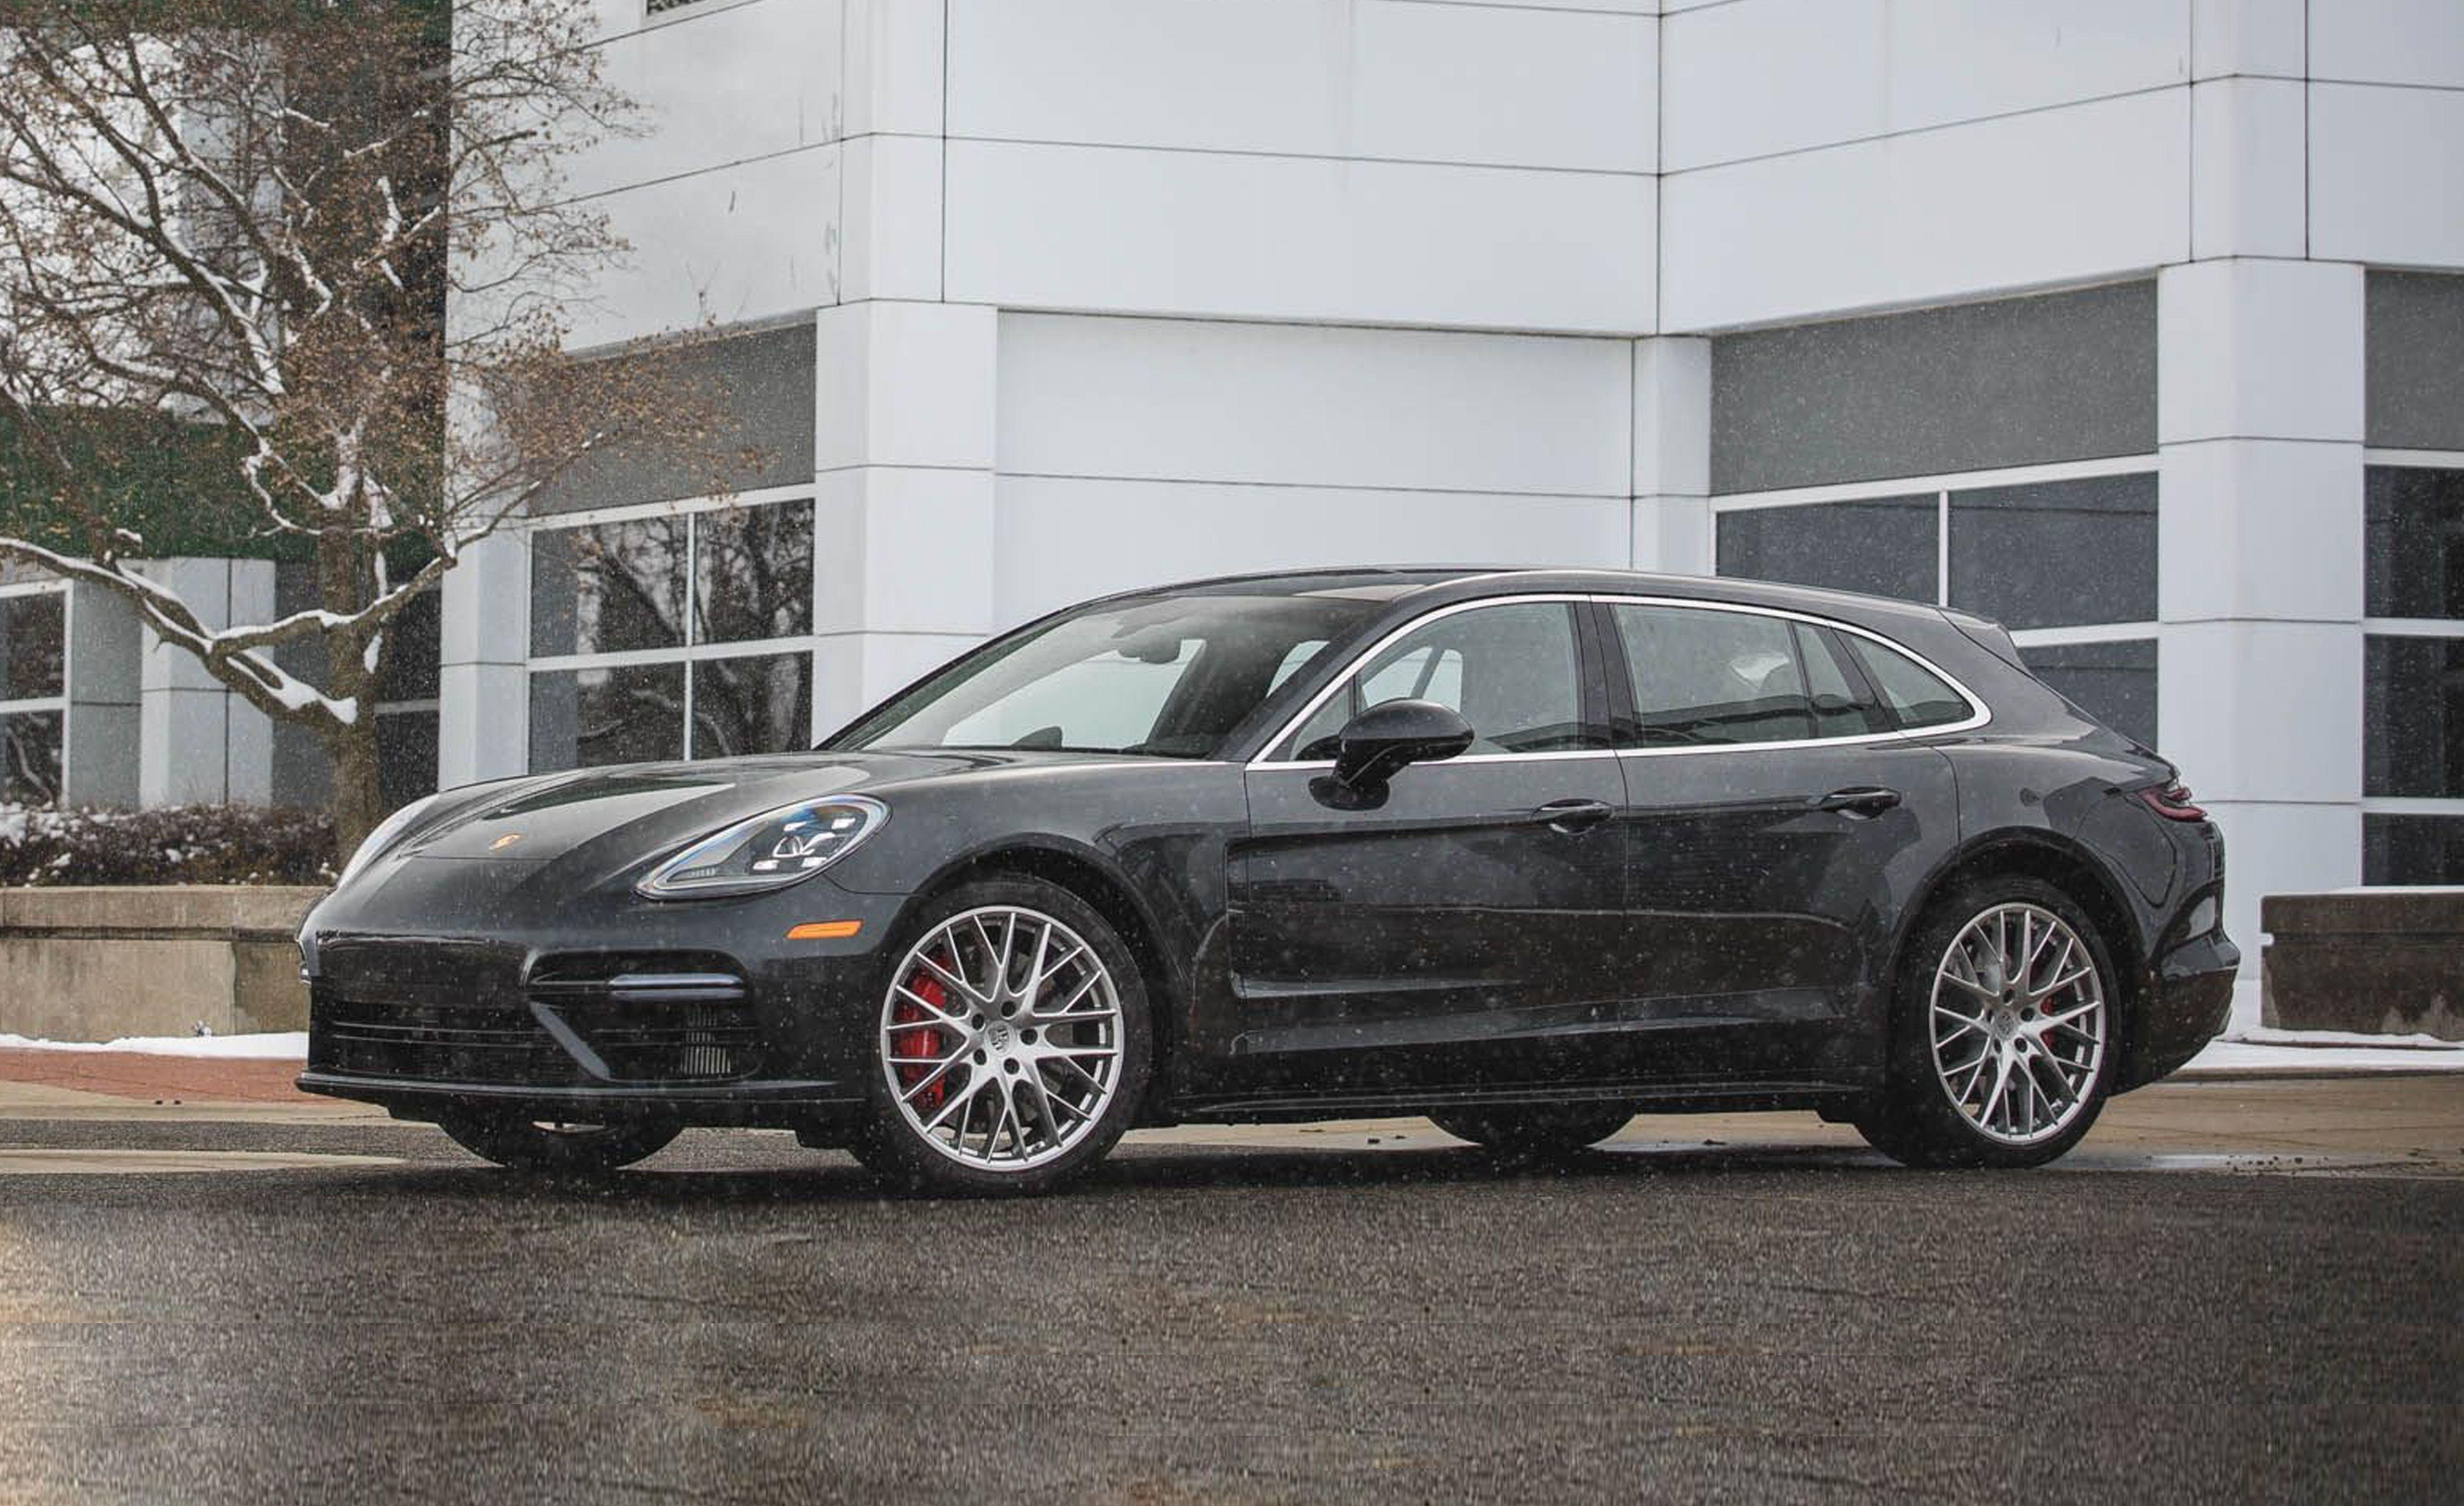 2019 Porsche Panamera Sport Turismo Reviews | Porsche Panamera Sport Turismo Price, Photos, and Specs | Car and Driver